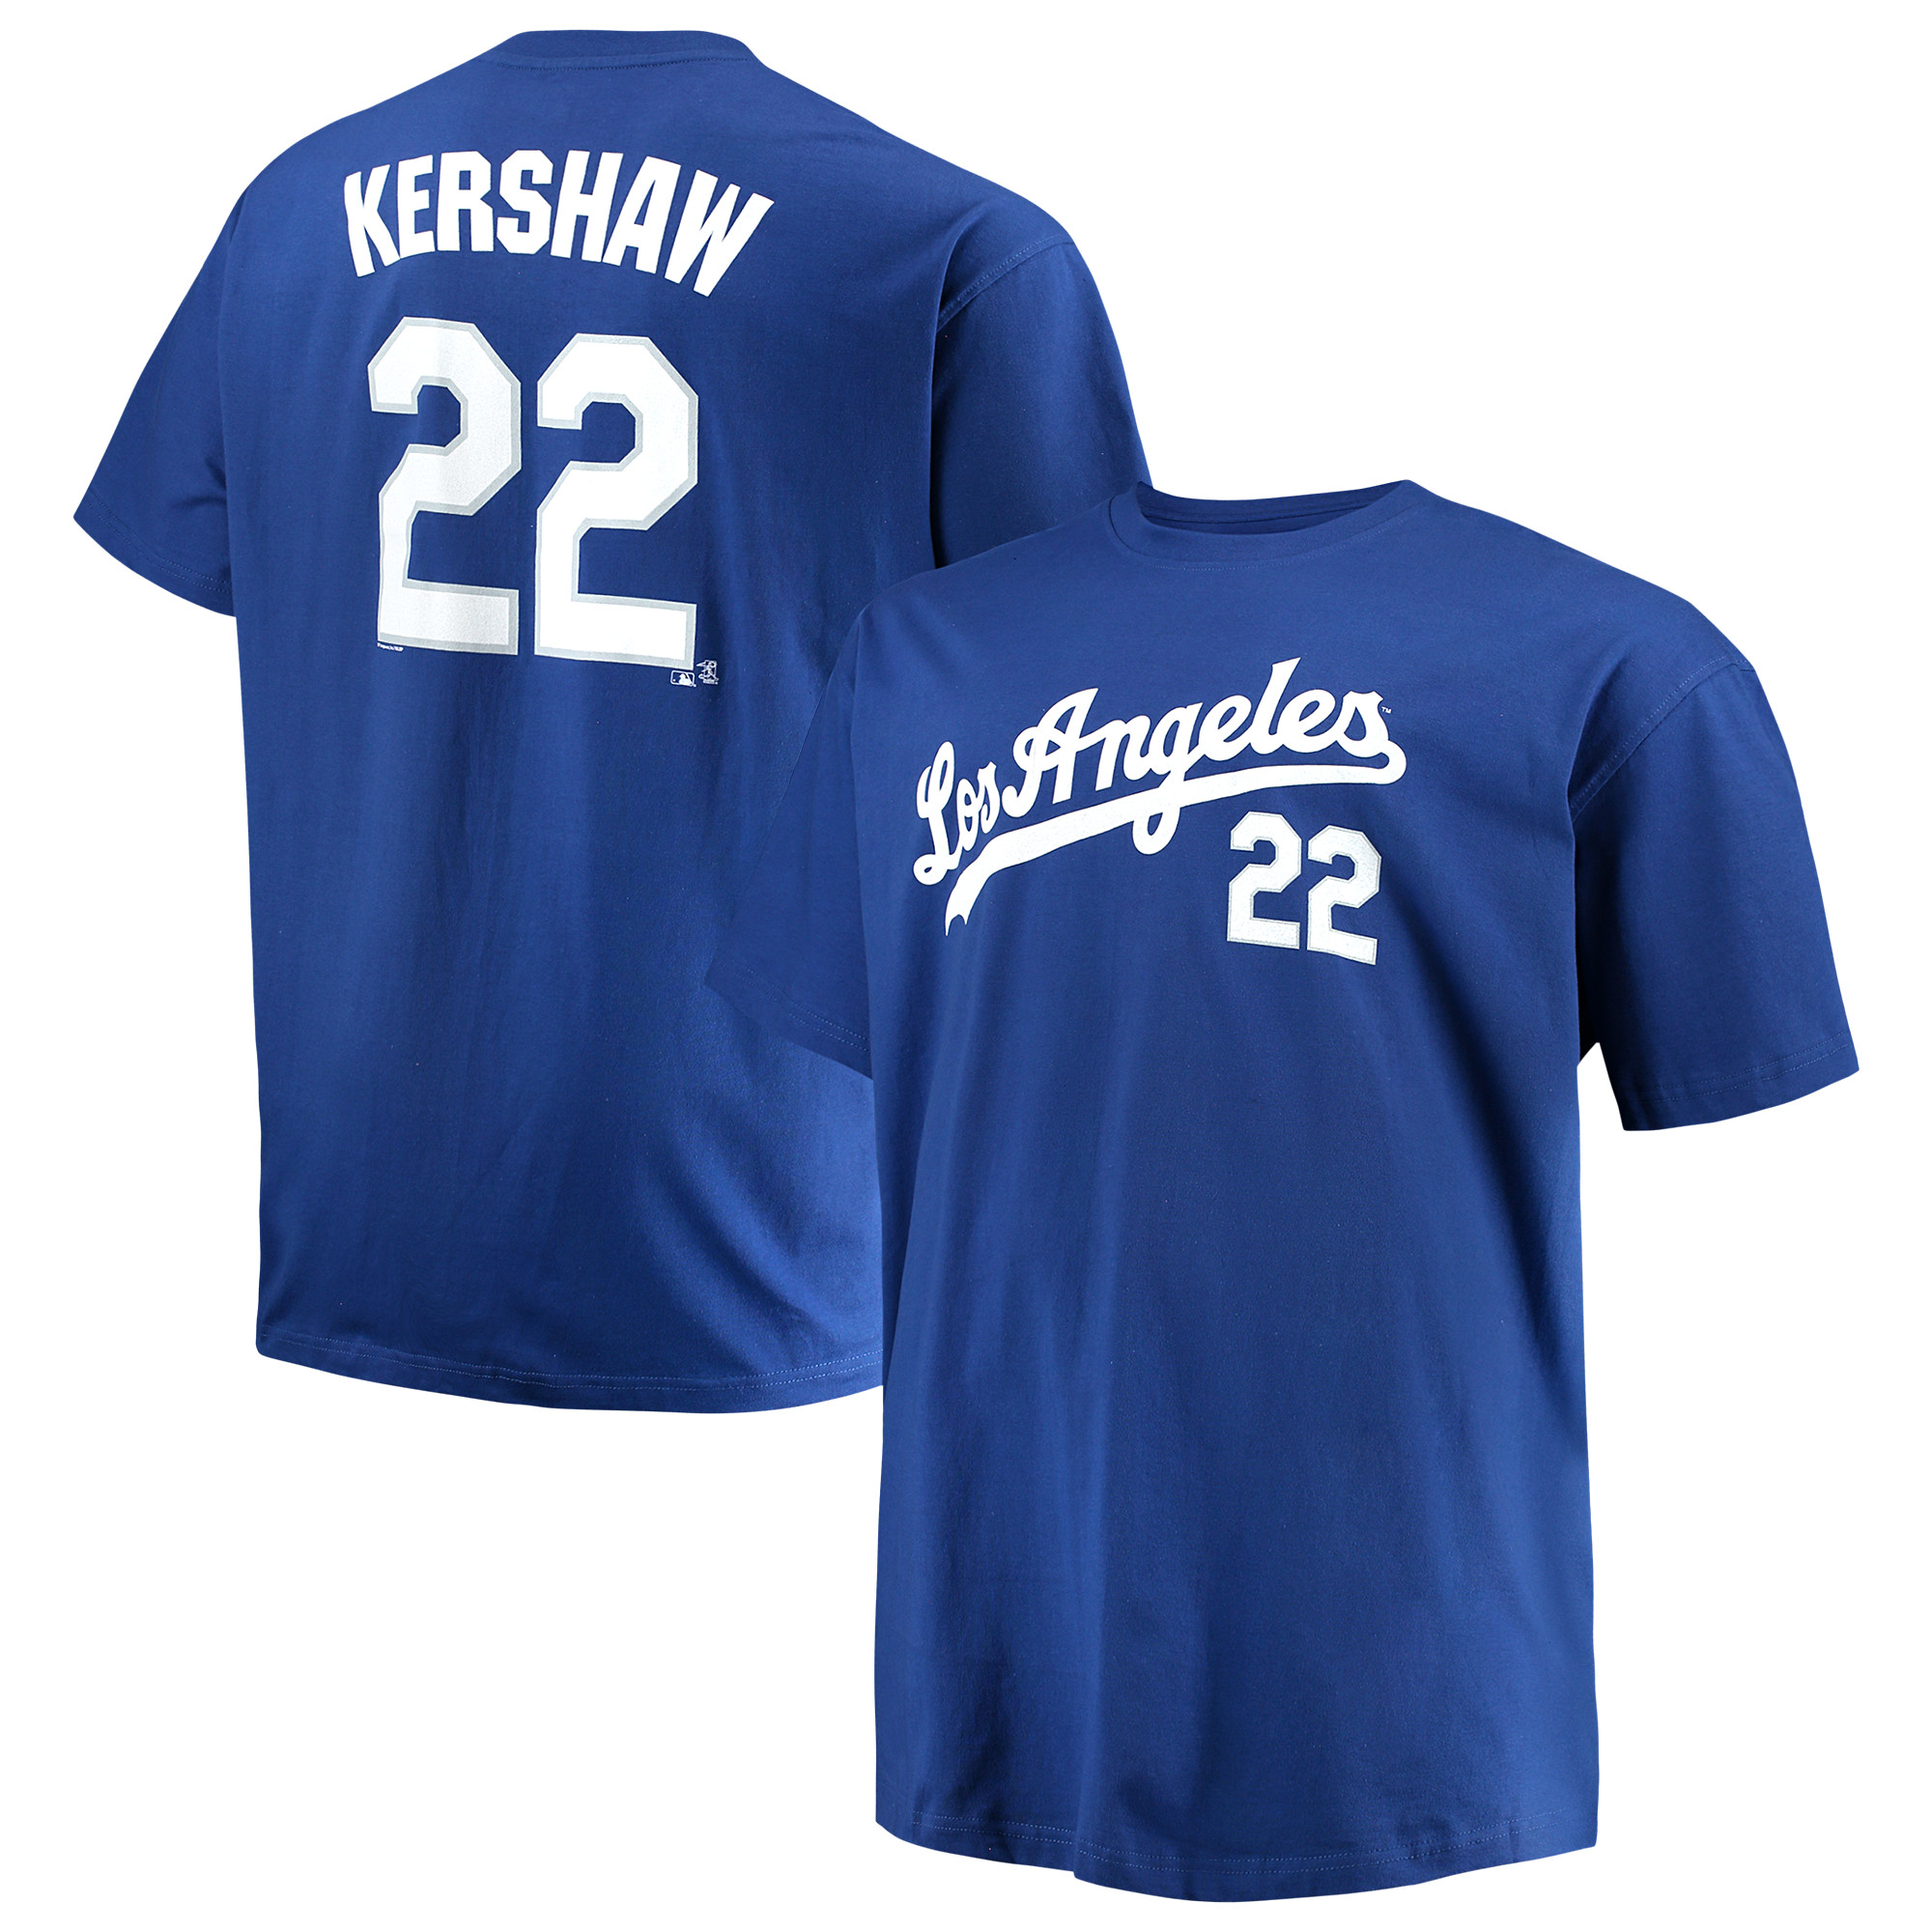 Men's Majestic Clayton Kershaw Royal Los Angeles Dodgers MLB Name & Number T-Shirt